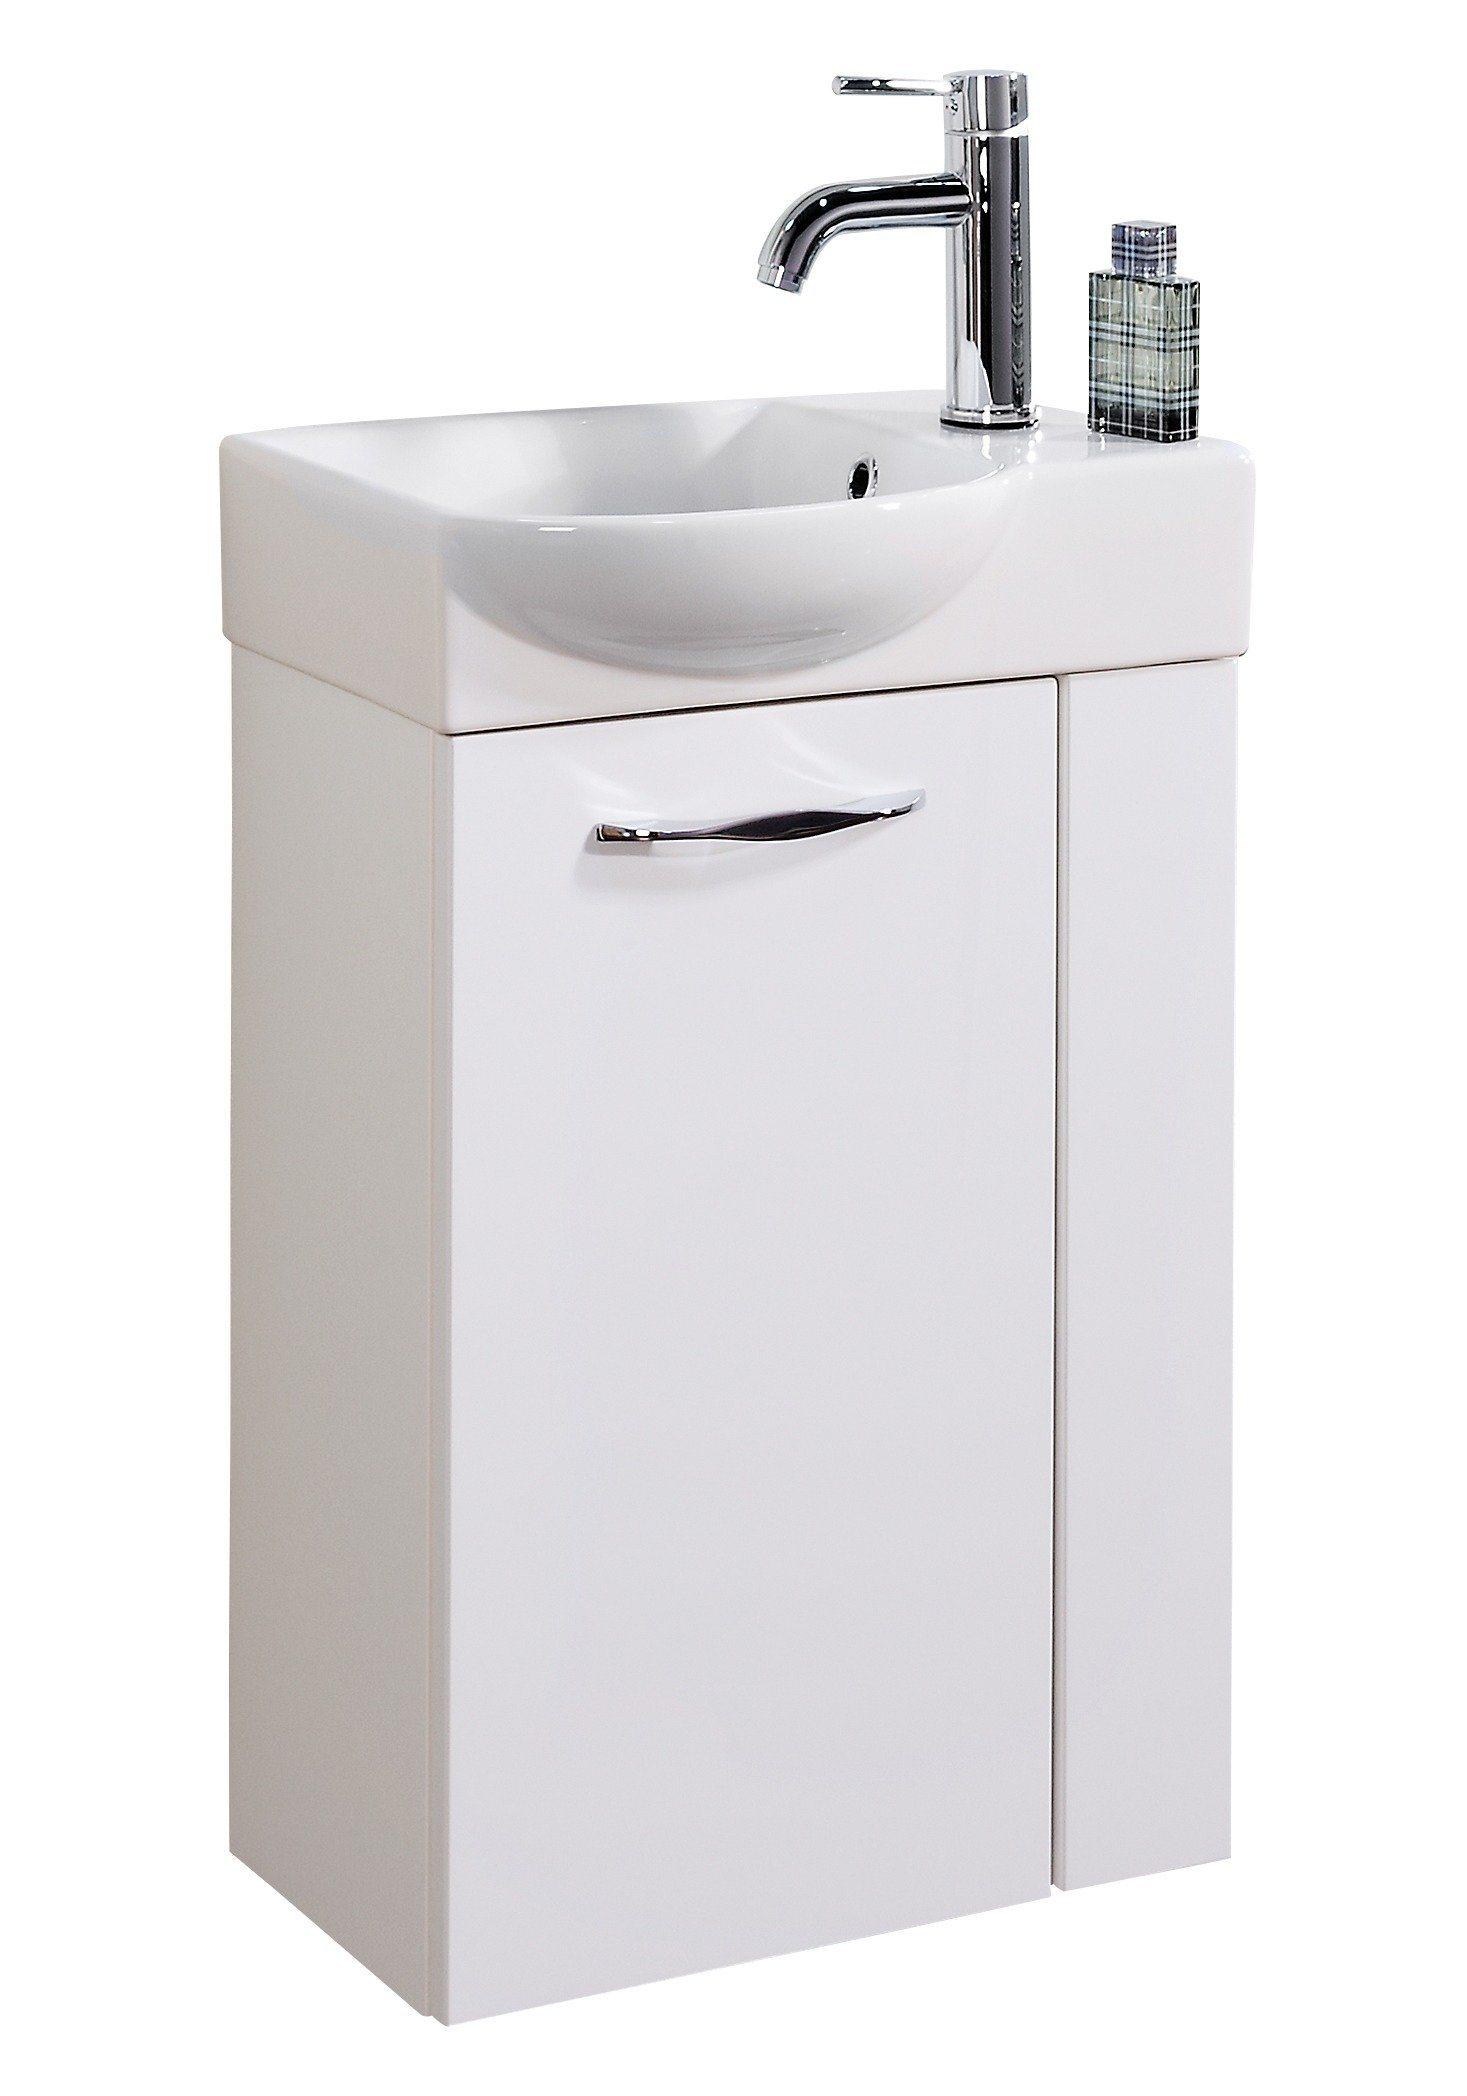 Mini-Gäste-WC-Lösung »SCENO «, Breite 45 cm, Tiefe 32 cm (2-tlg.)